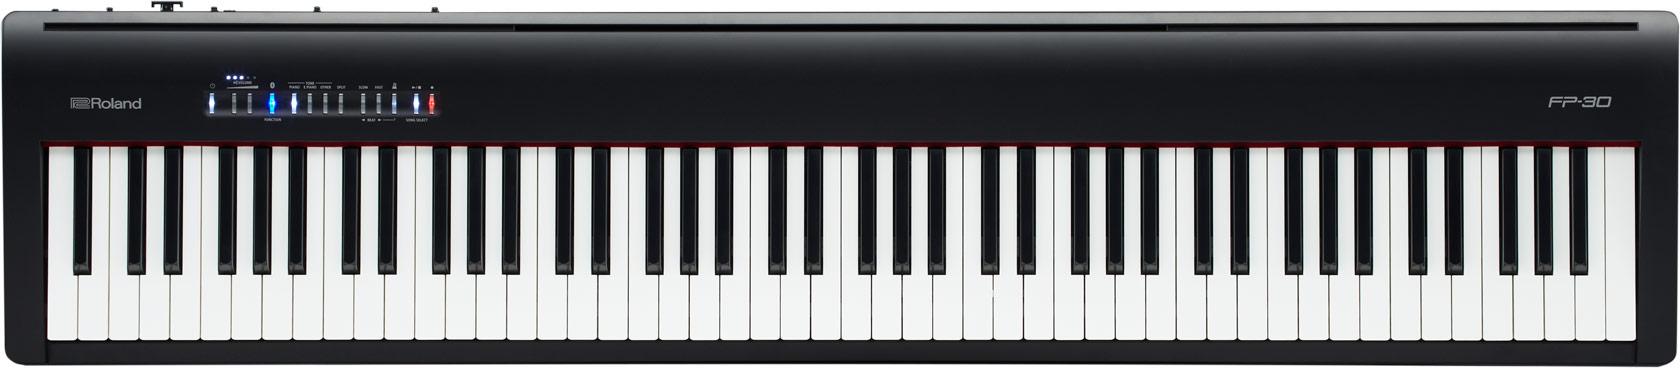 image: Roland FP-30 piano